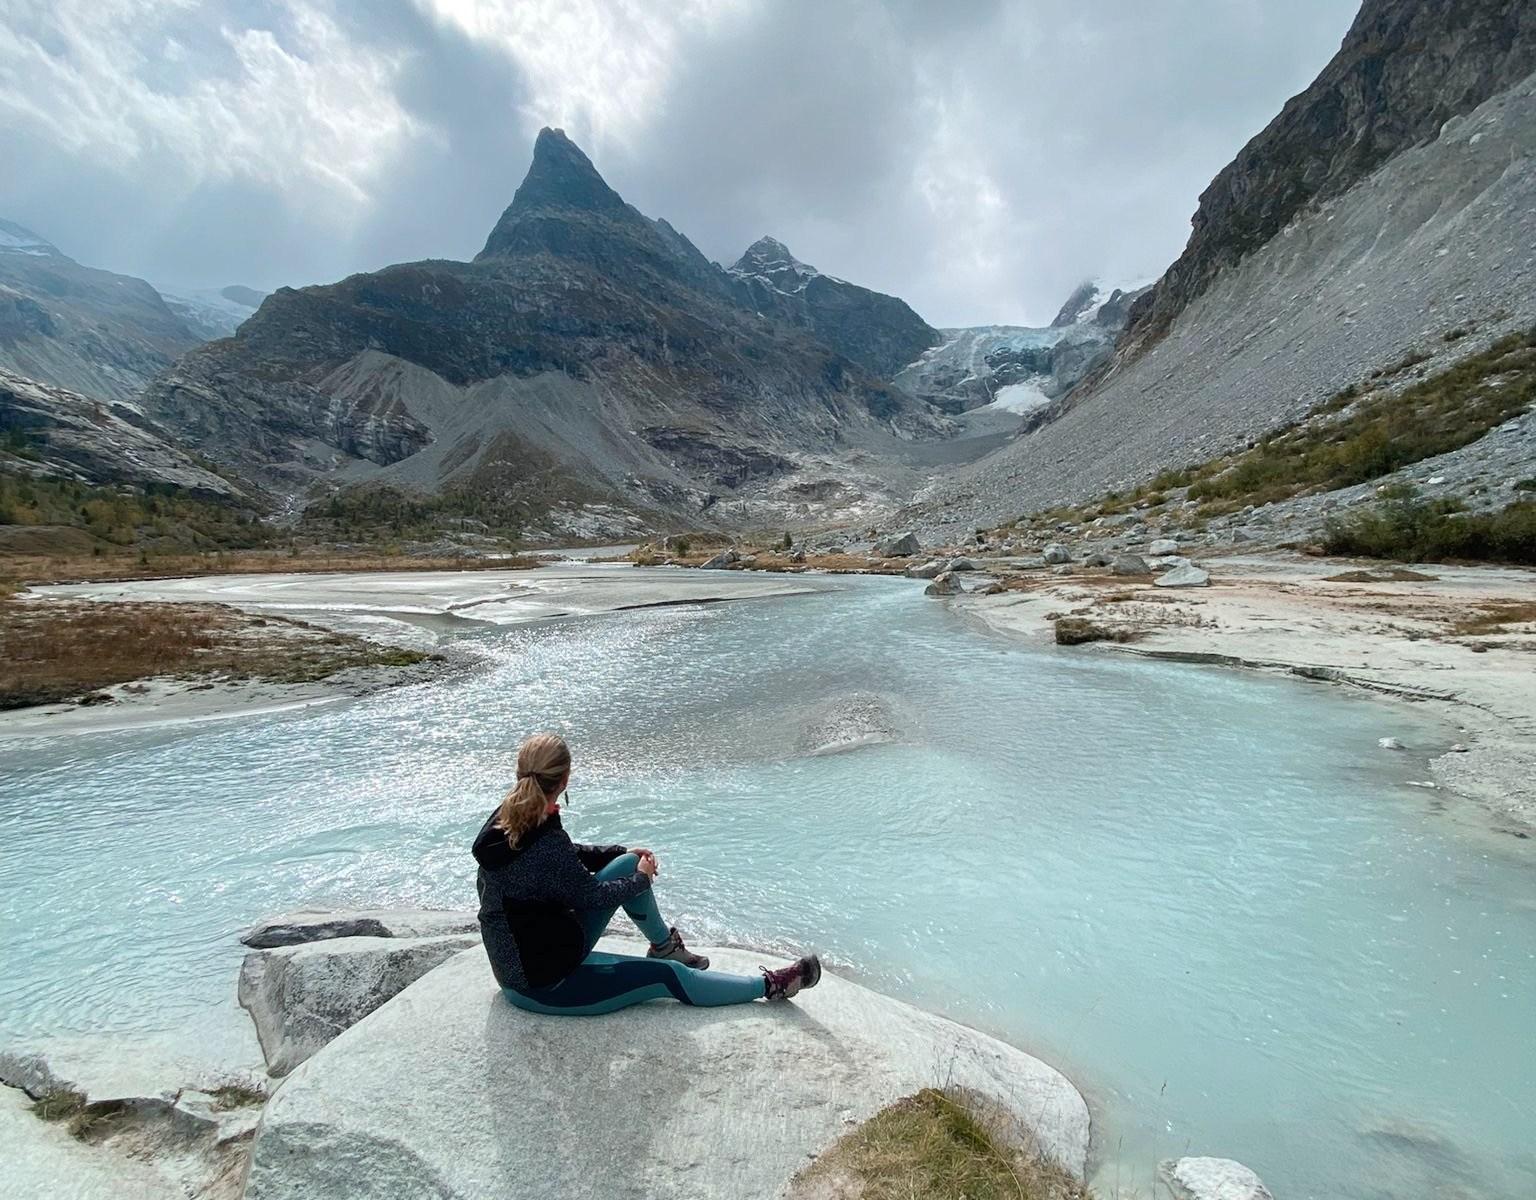 Ferpècle hike Valais Switzerland